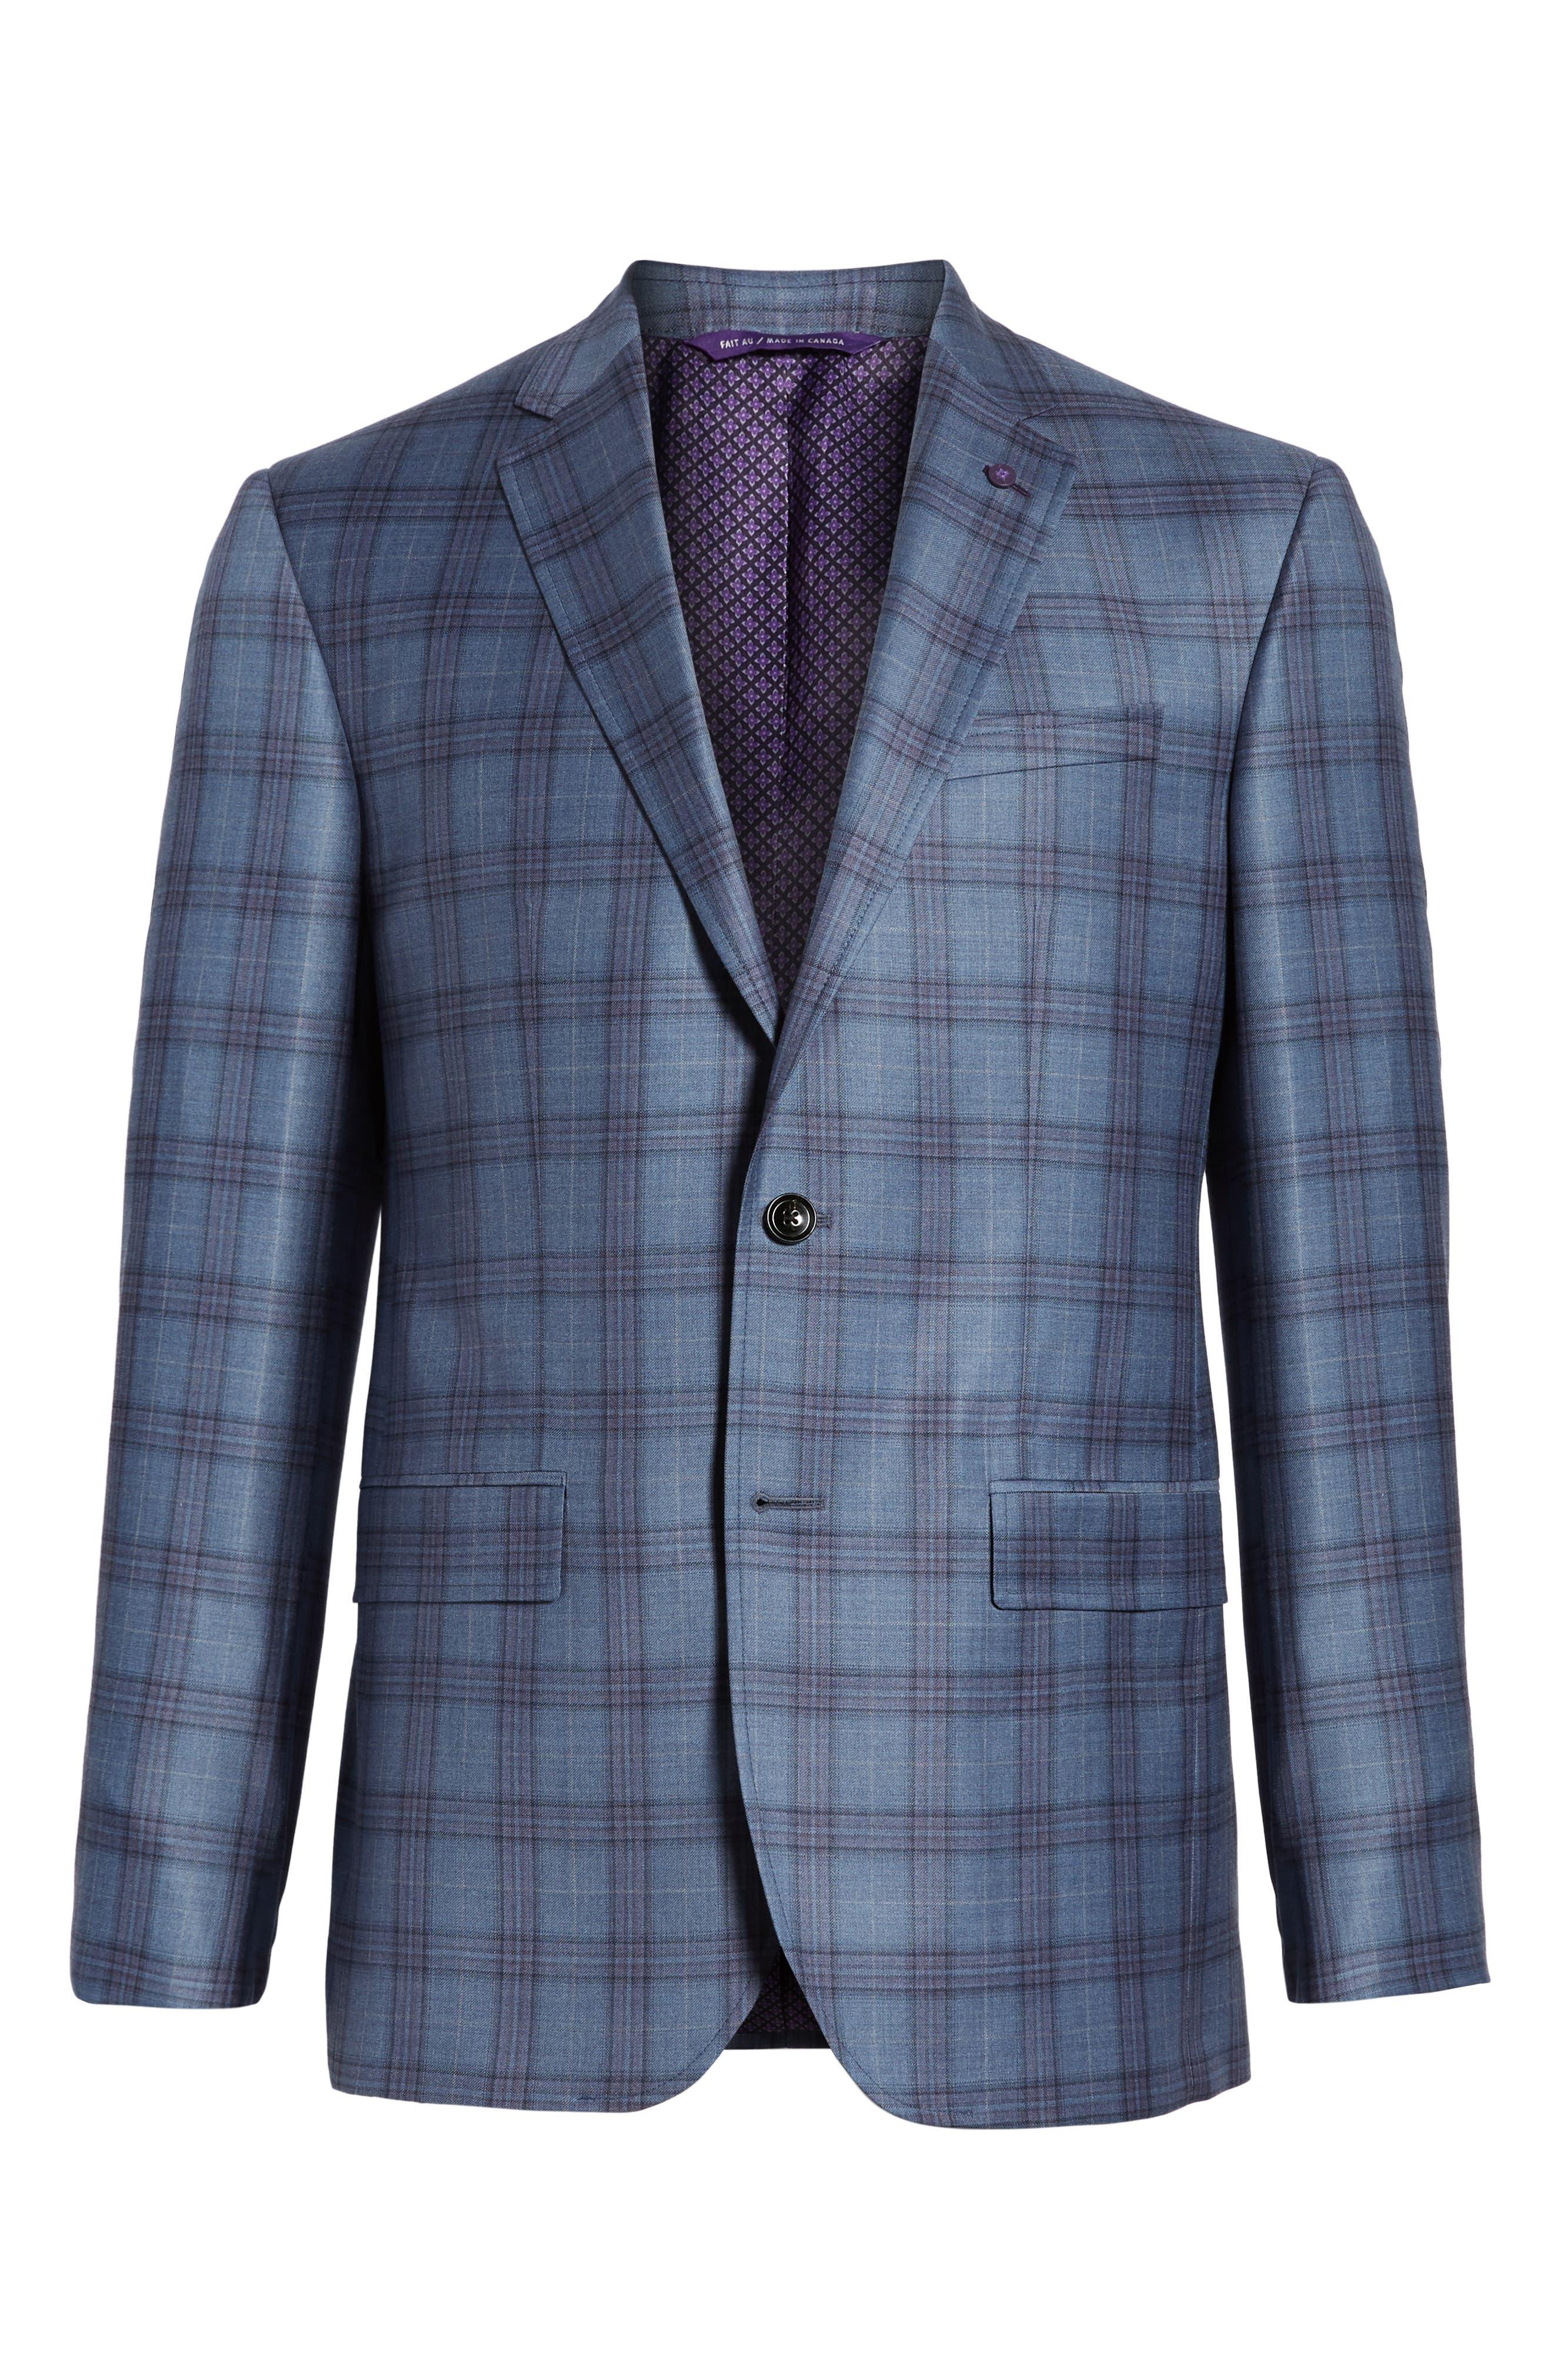 Jay Trim Fit Plaid Wool Sport Coat,                             Alternate thumbnail 5, color,                             400